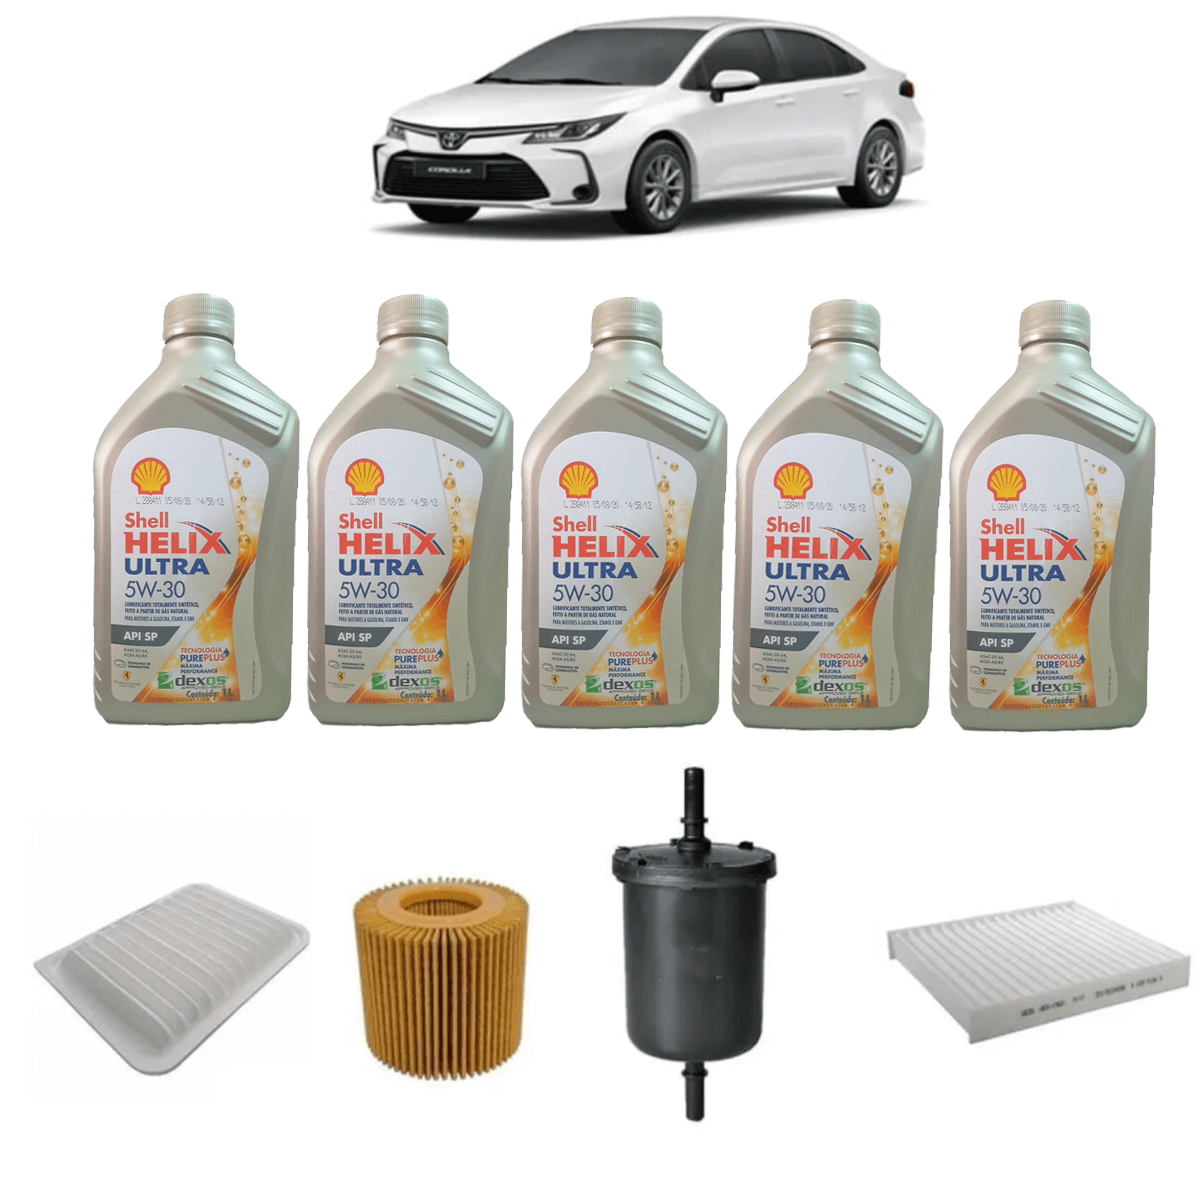 Kit De Filtros E Oleo Corolla 2.0 Xei Xrs Shell Ultra 5w30 em até 6x sem juros